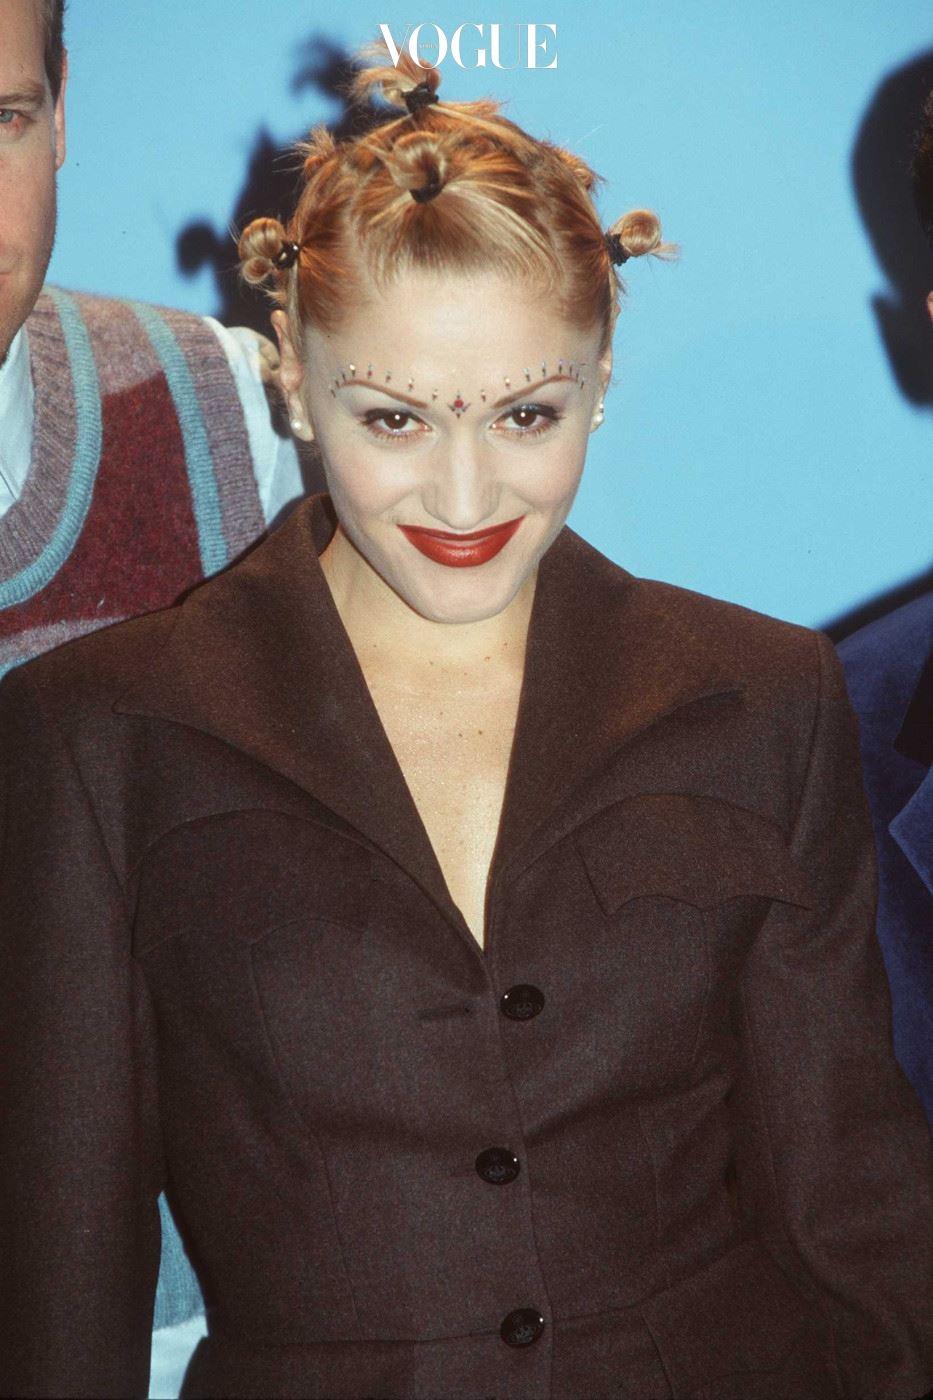 12/8/97 Las Vegas, NV. Gwen Stefani of No Doubt at the 1997 Billboard Music Awards.